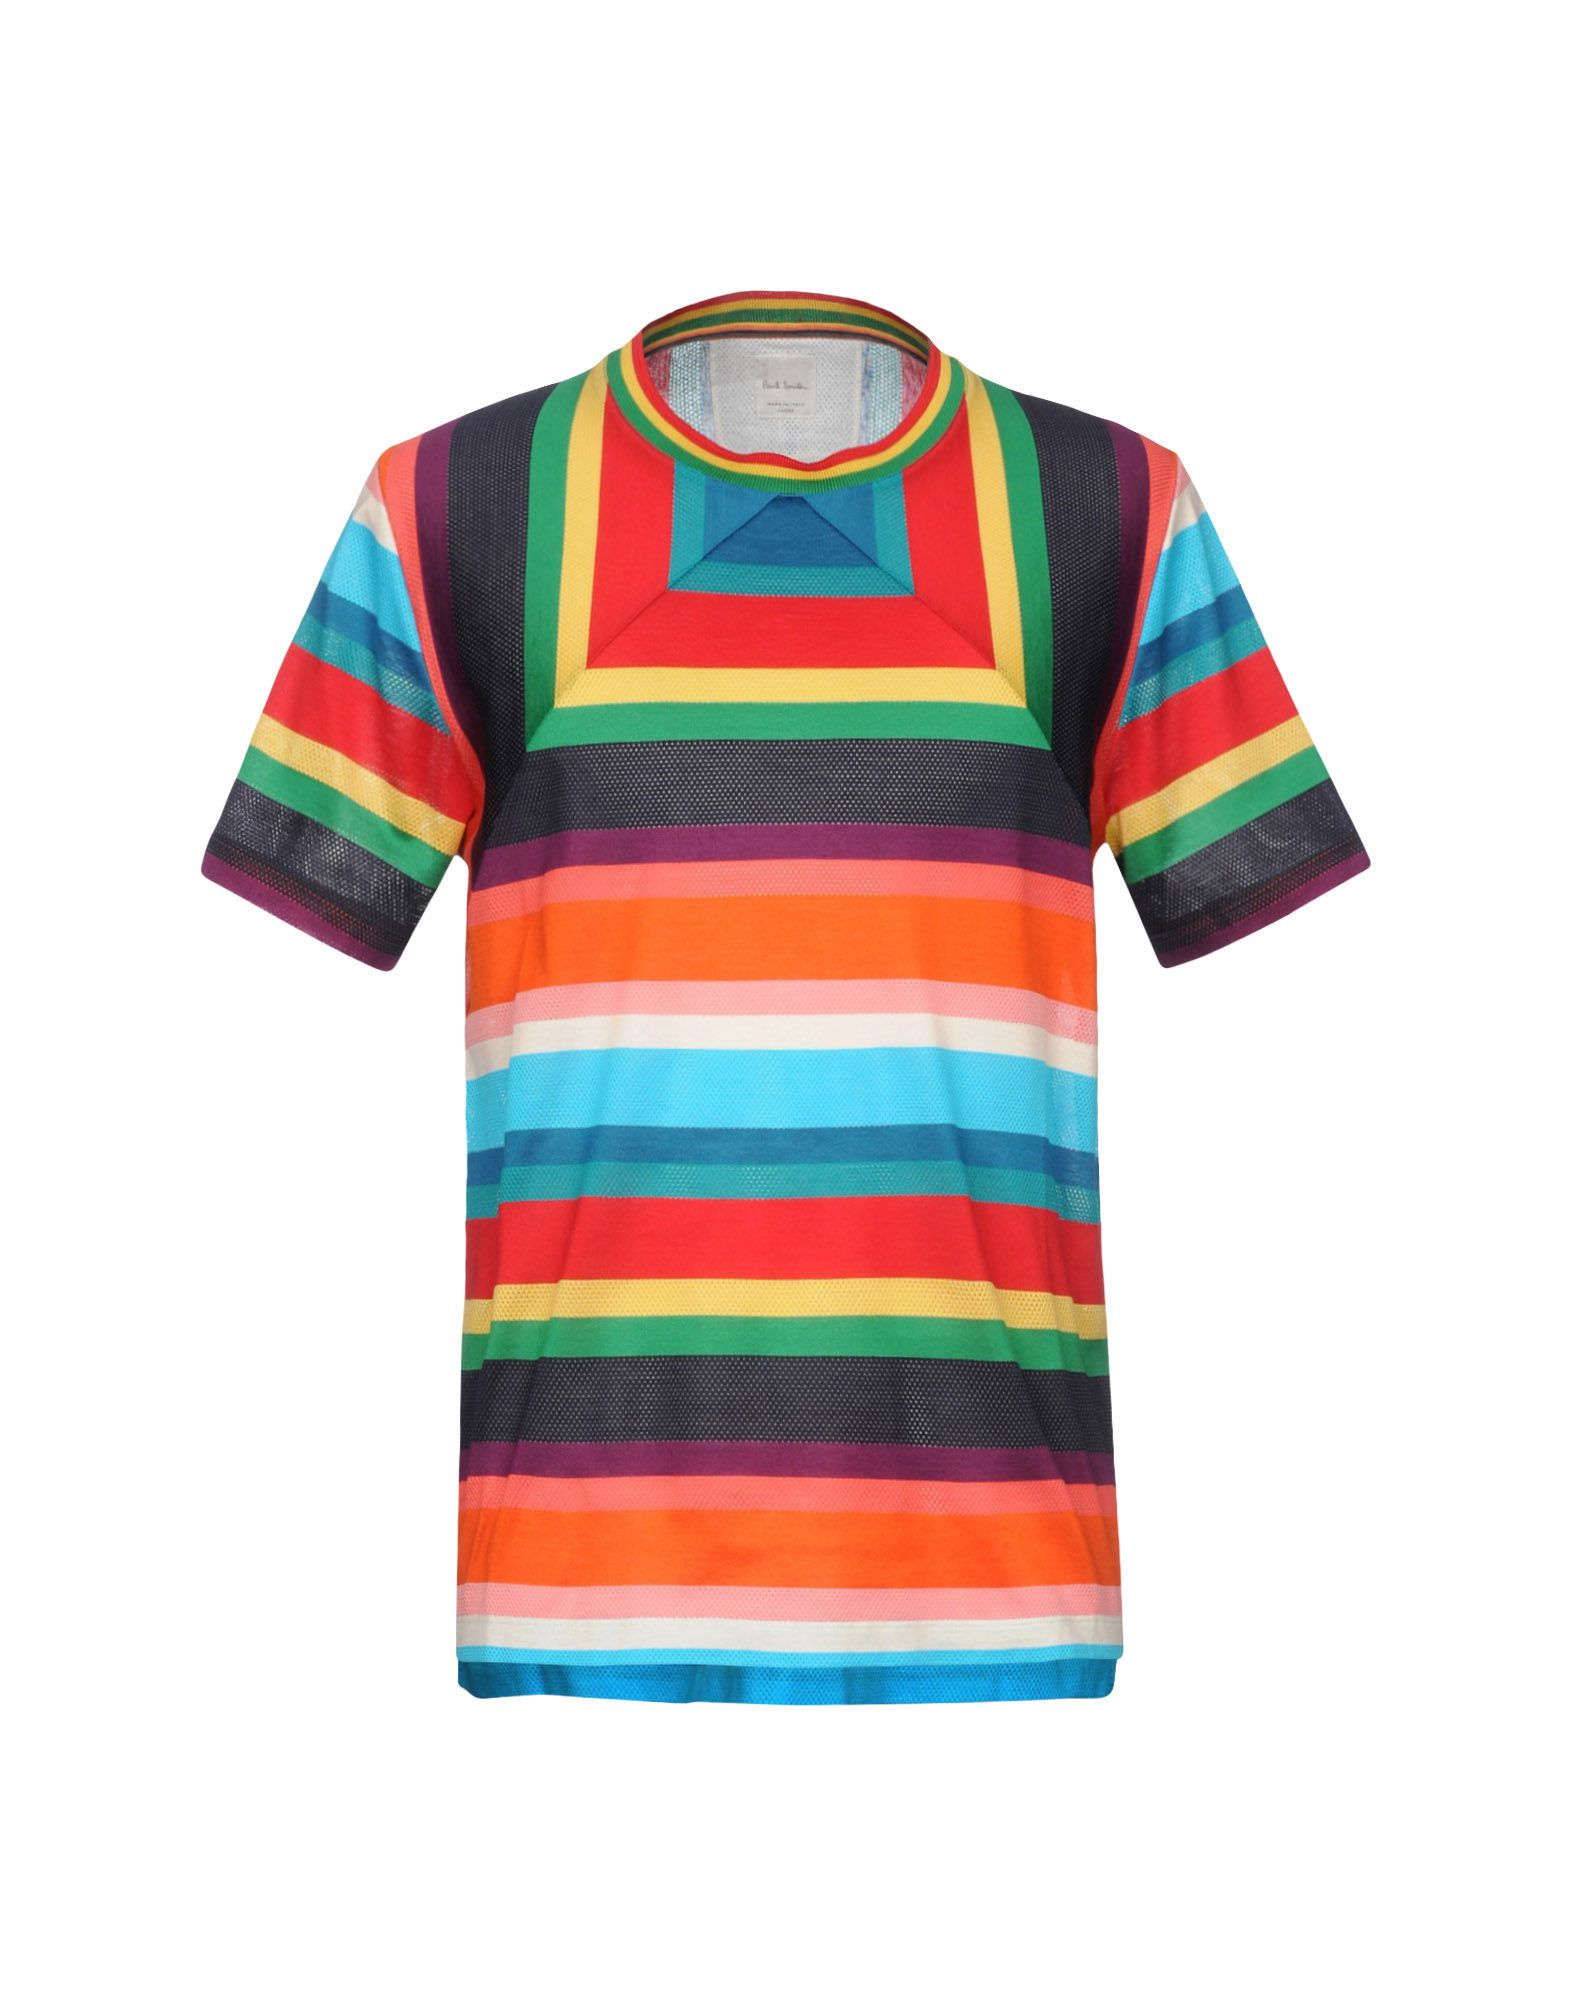 T-Shirt Paul Smith Uomo - Acquista online su